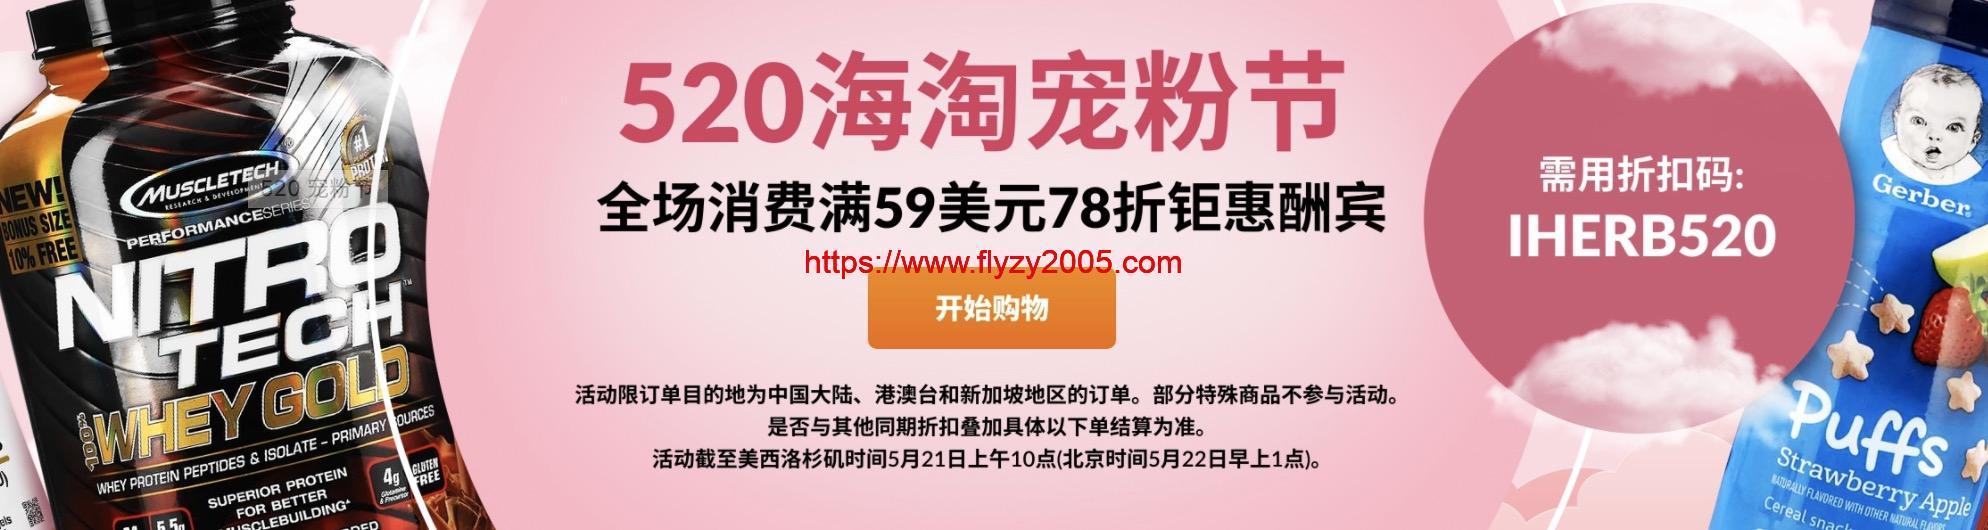 iHerb 520优惠